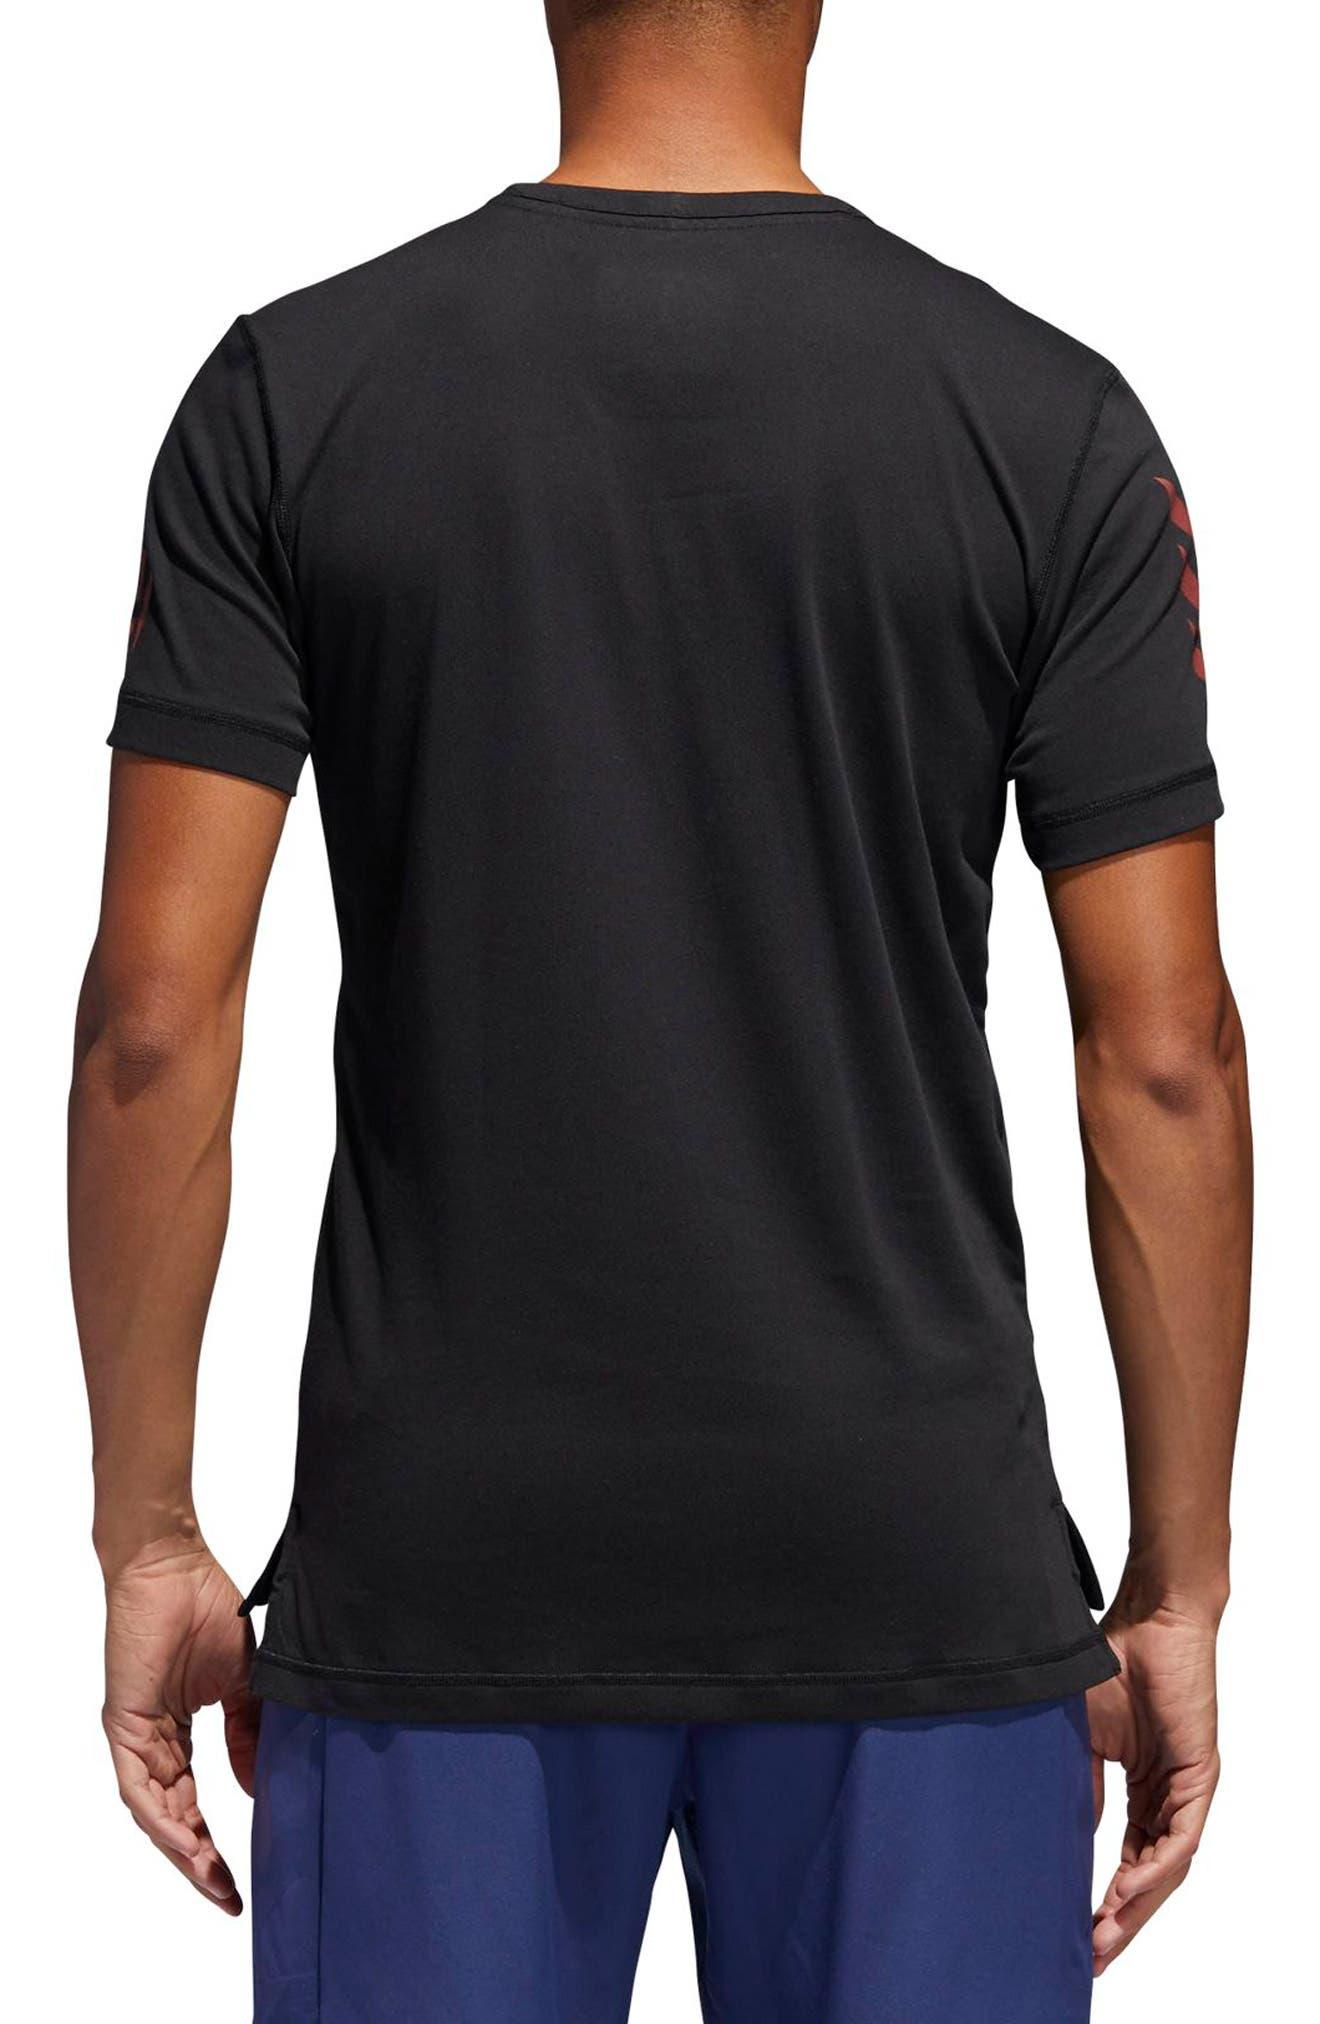 Harden Brand Slogan T-Shirt,                             Alternate thumbnail 2, color,                             001